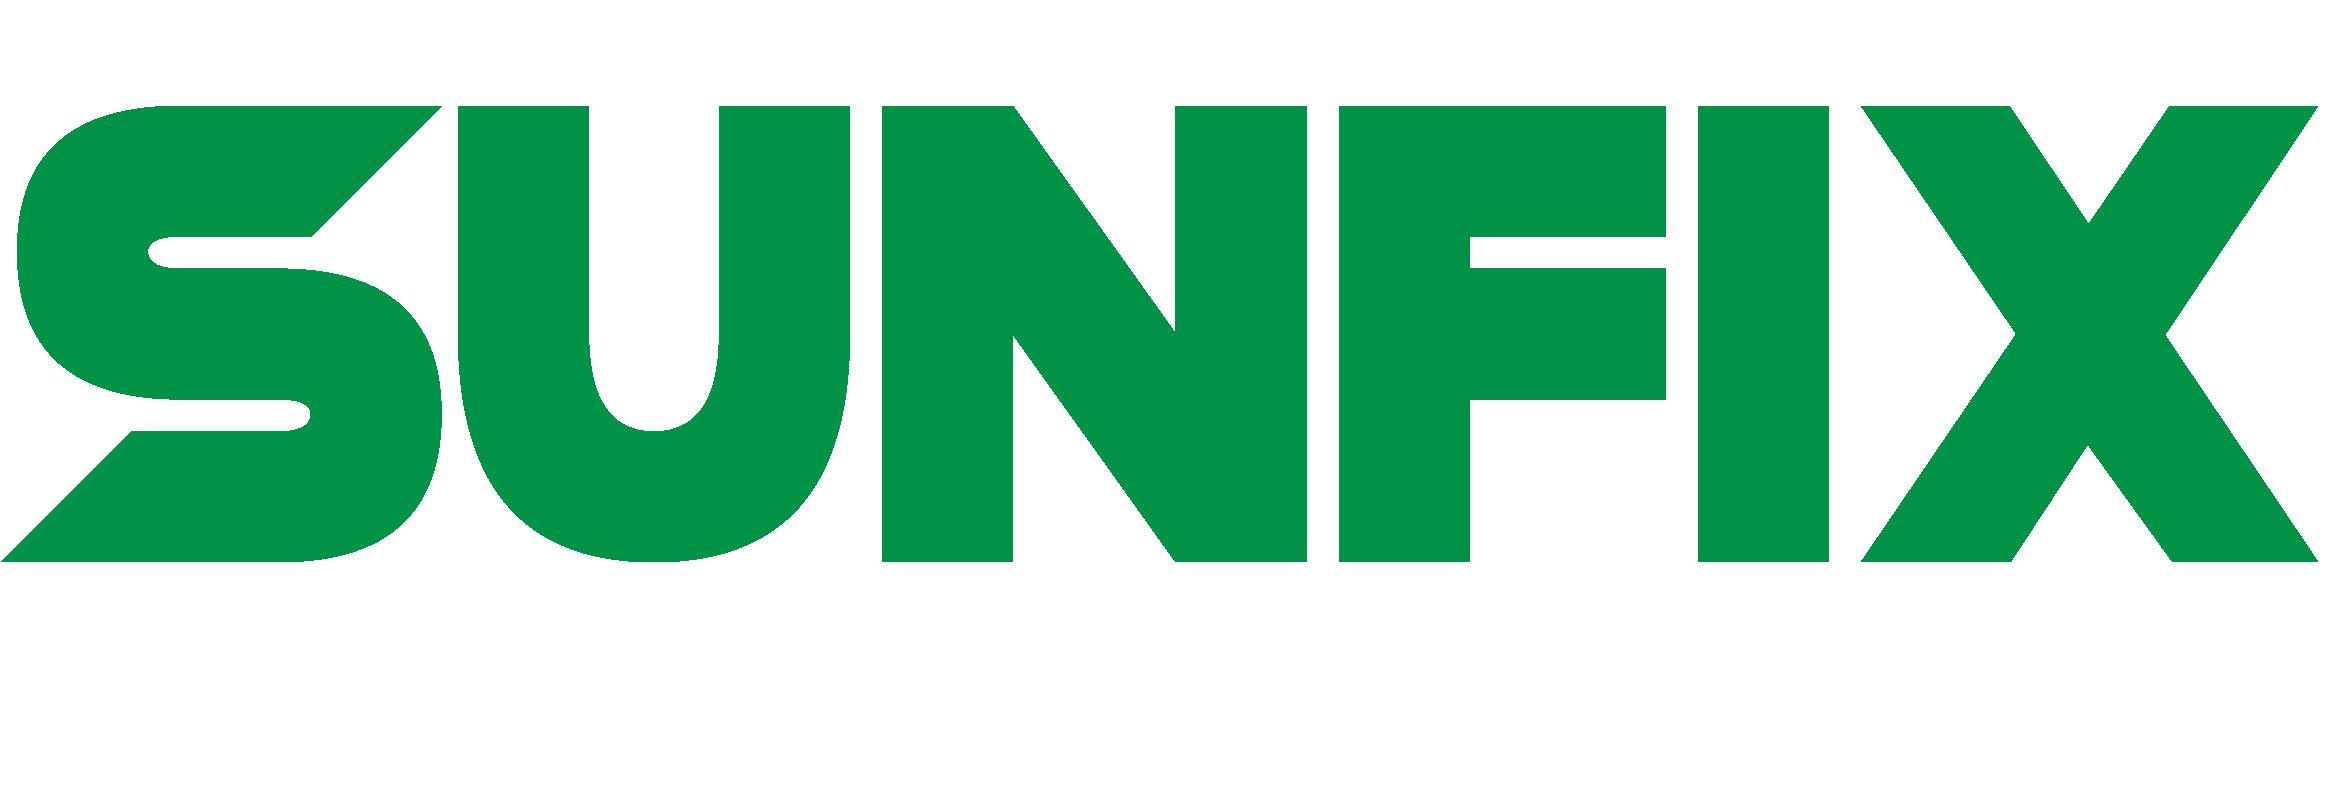 https://secureservercdn.net/198.71.233.199/sz0.269.myftpupload.com/wp-content/uploads/2020/10/SUNFIX-Consulting-W.png?time=1623617305